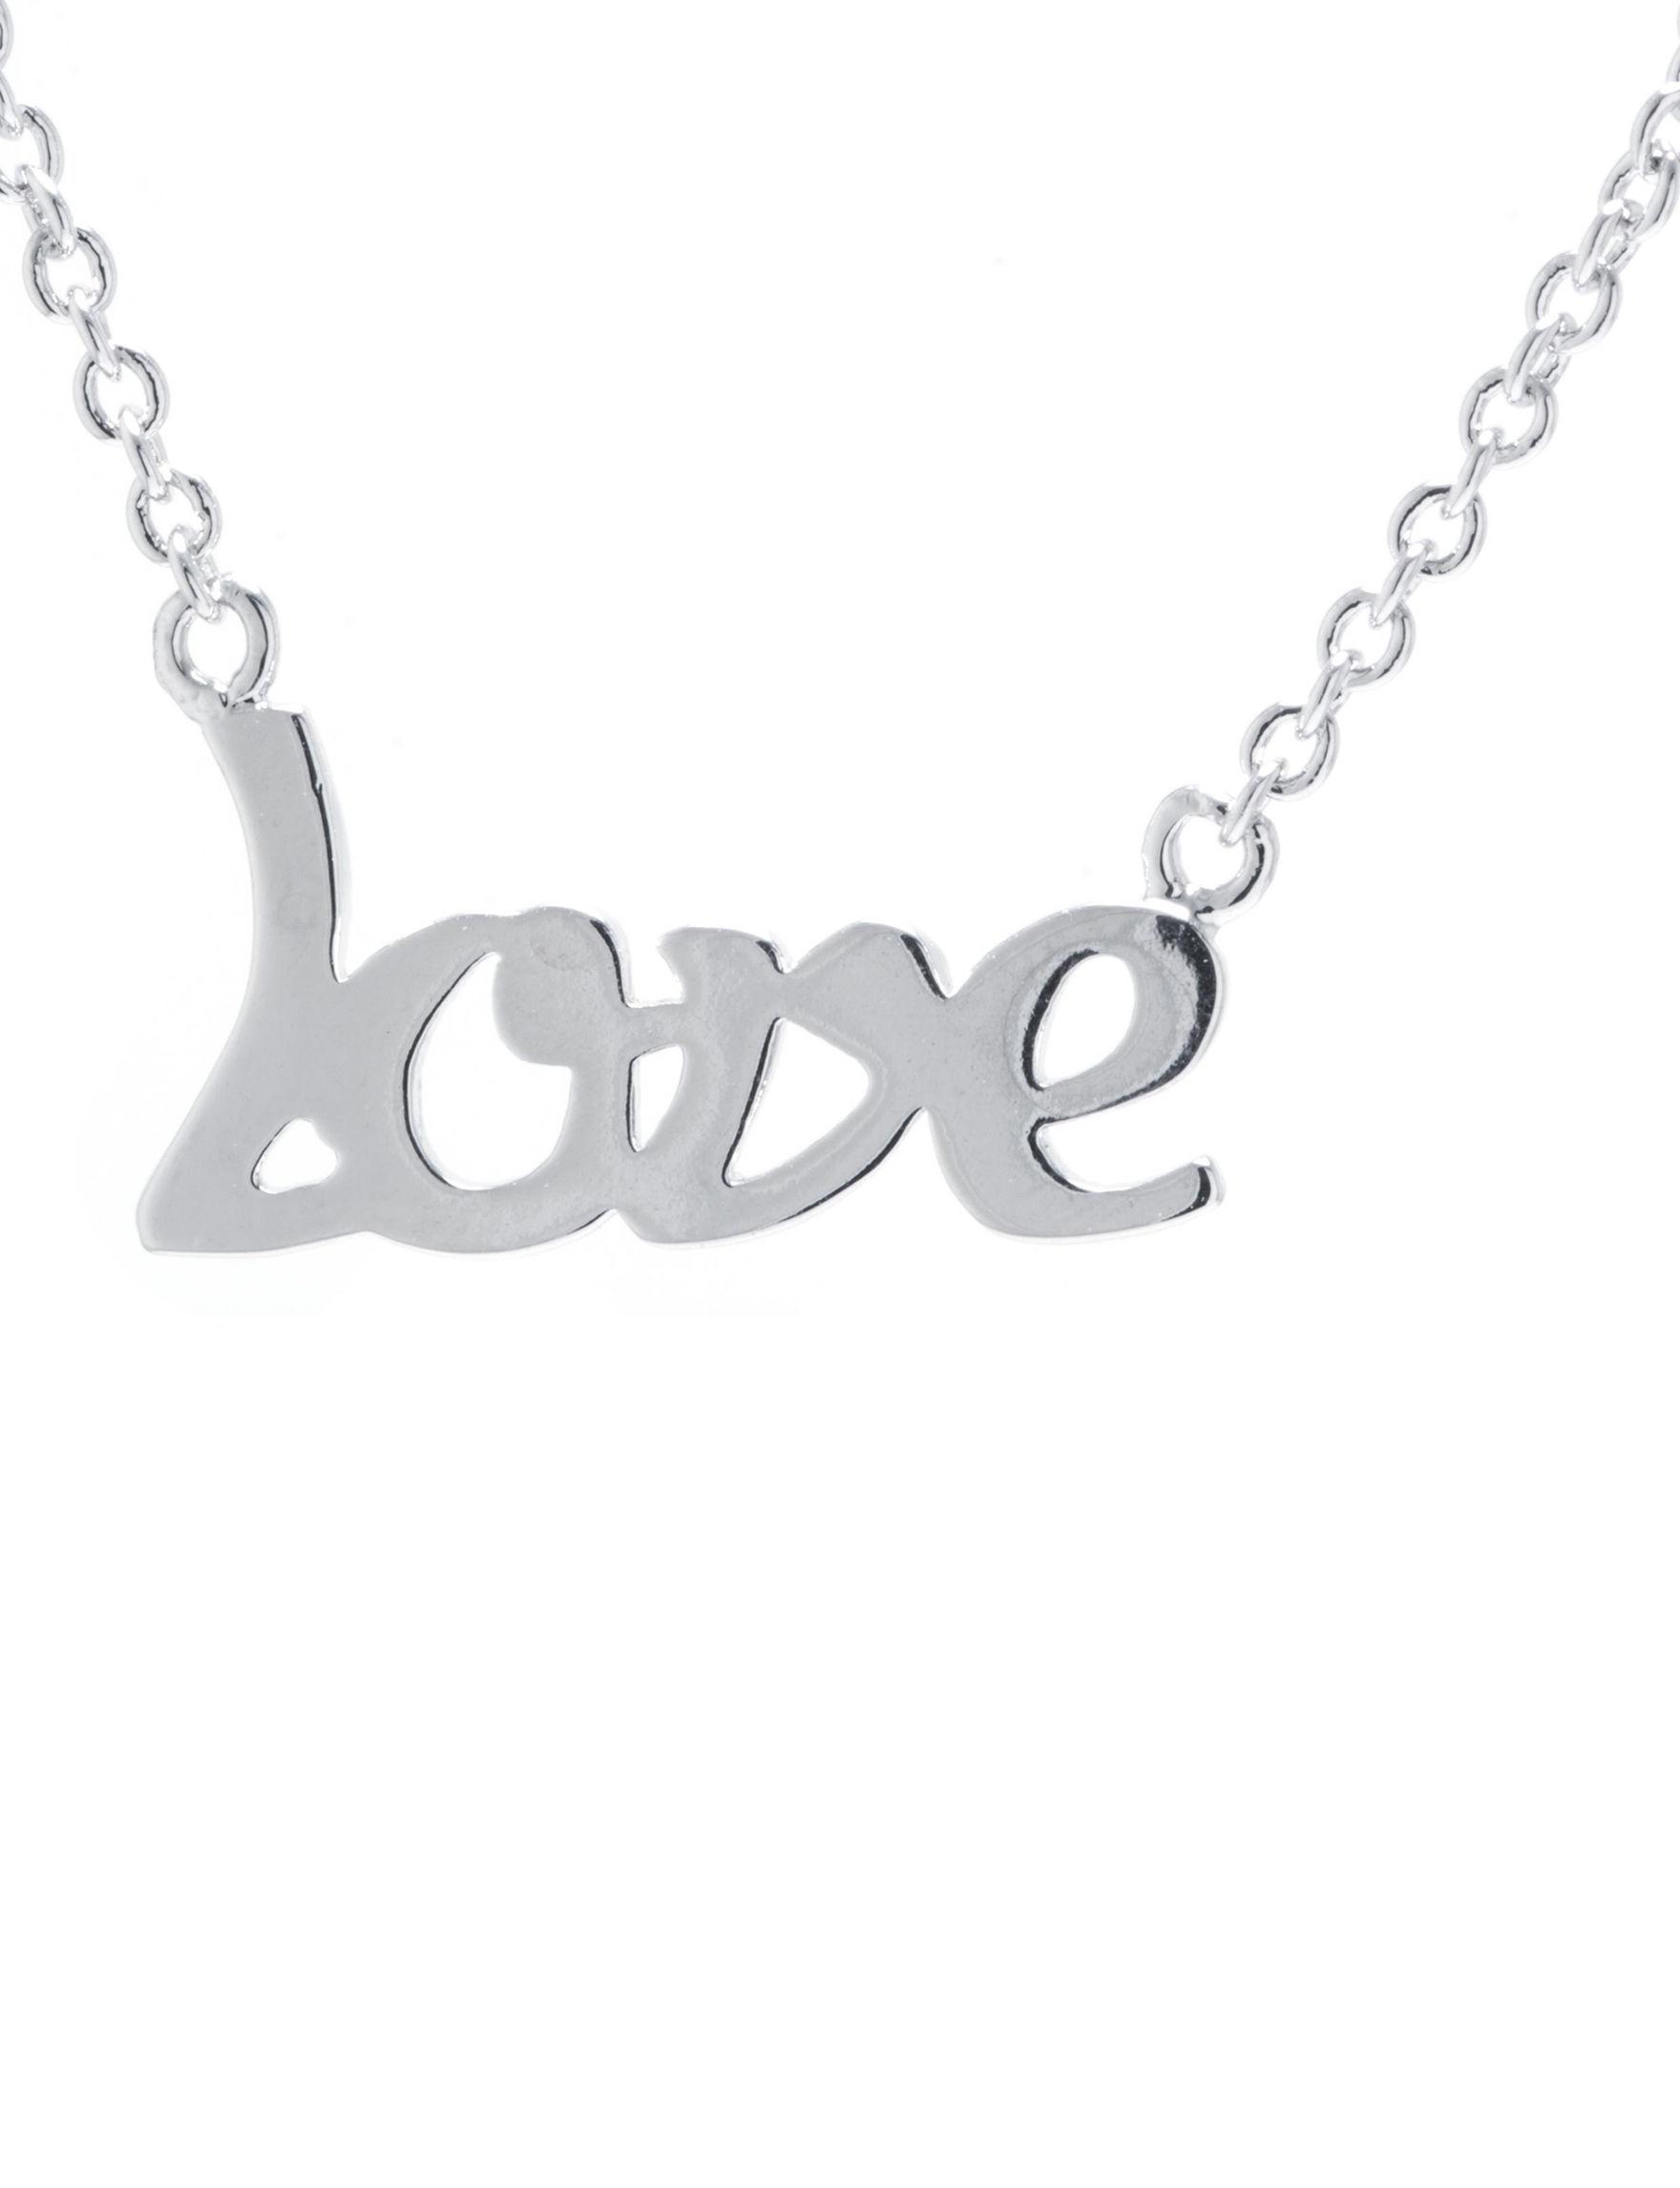 Athra Silver Necklaces & Pendants Fine Jewelry